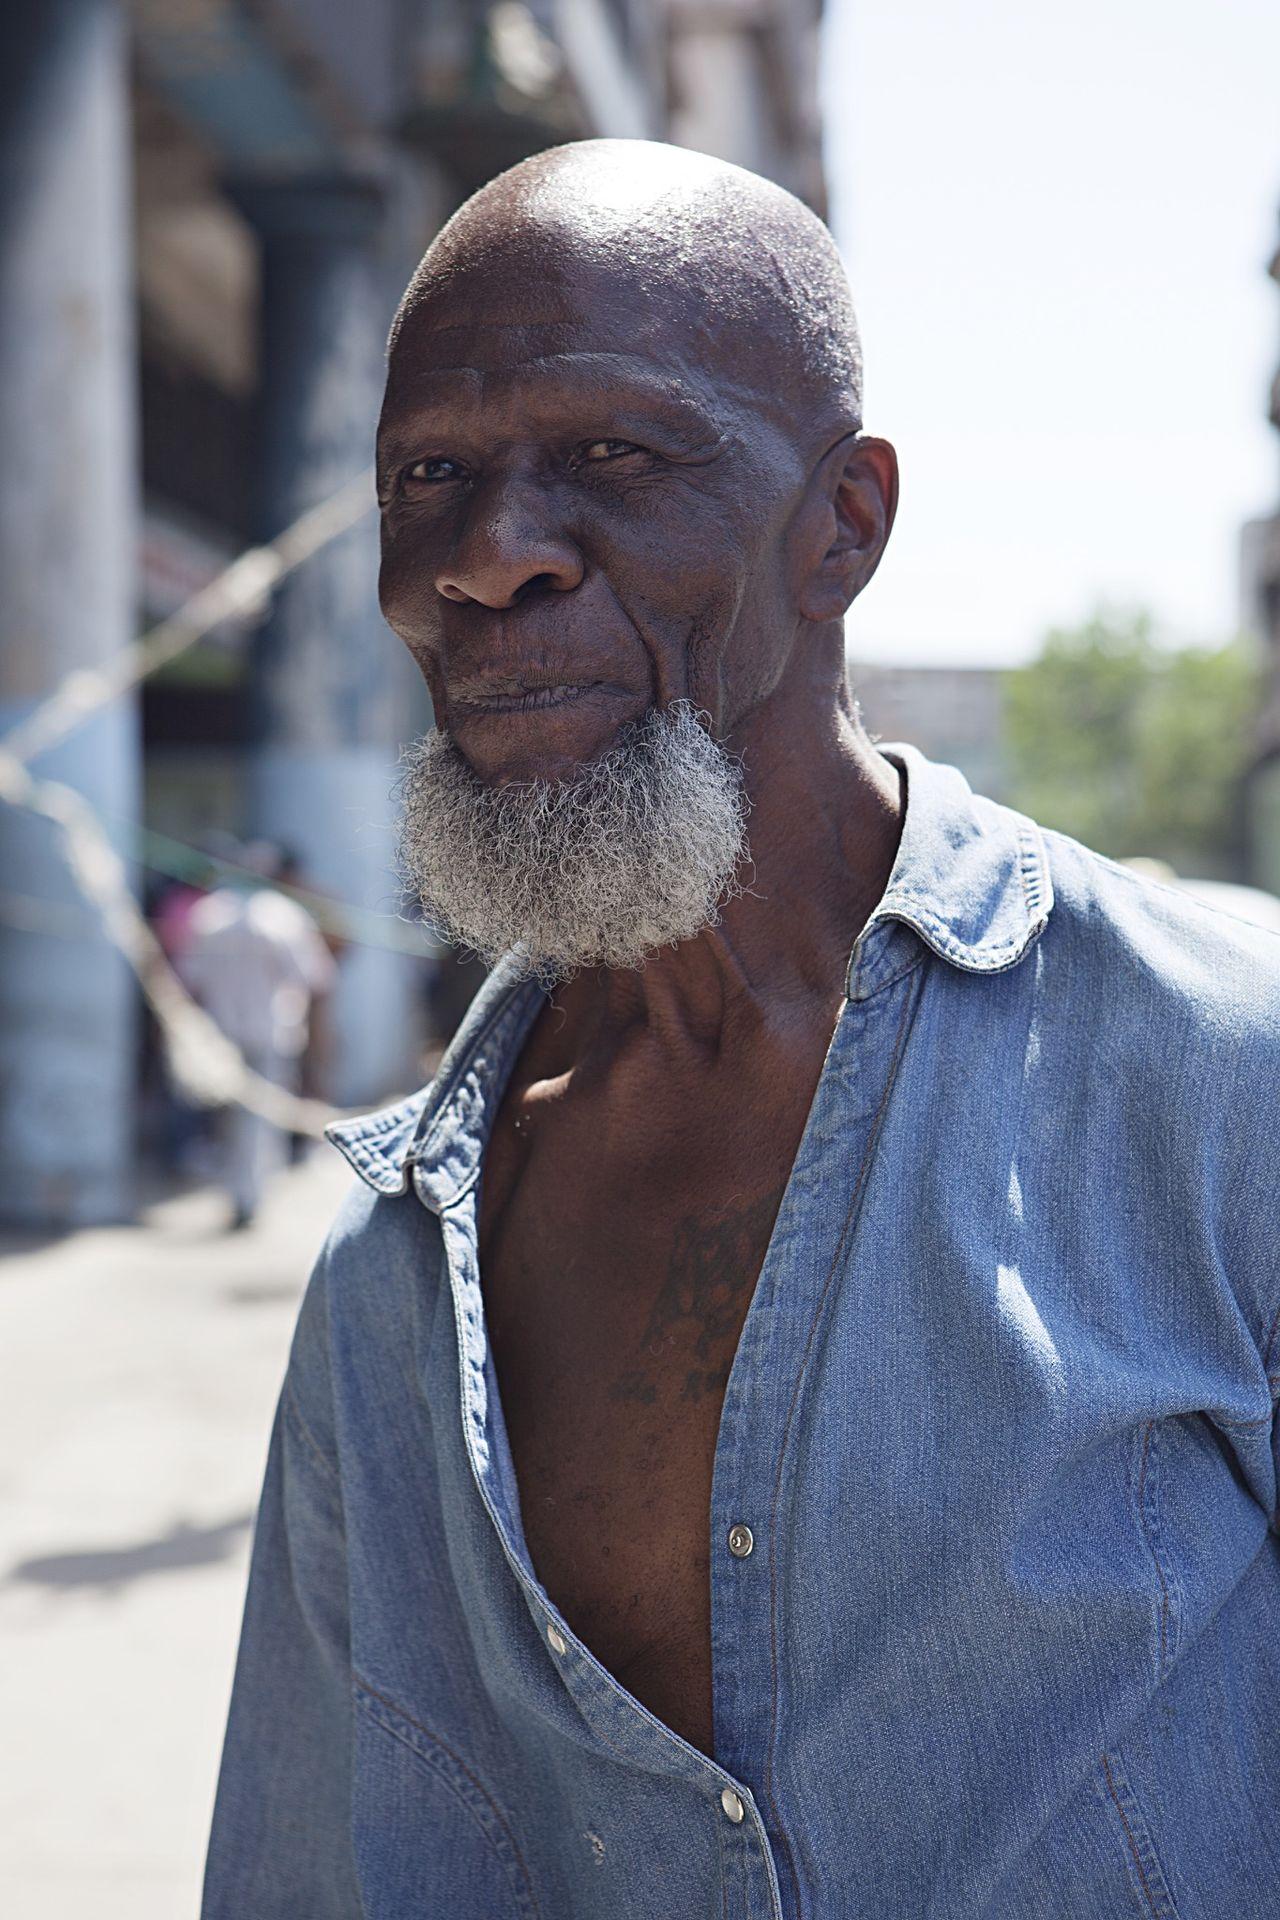 Cuba Cuban Cuban Man Man Havana Travel Street Photography Street Photography Cuba Portrait Portrait Of A Cuban Up Close Street Photography Telling Stories Differently Fine Art Photography The Portraitist - 2017 EyeEm Awards The Street Photographer - 2017 EyeEm Awards